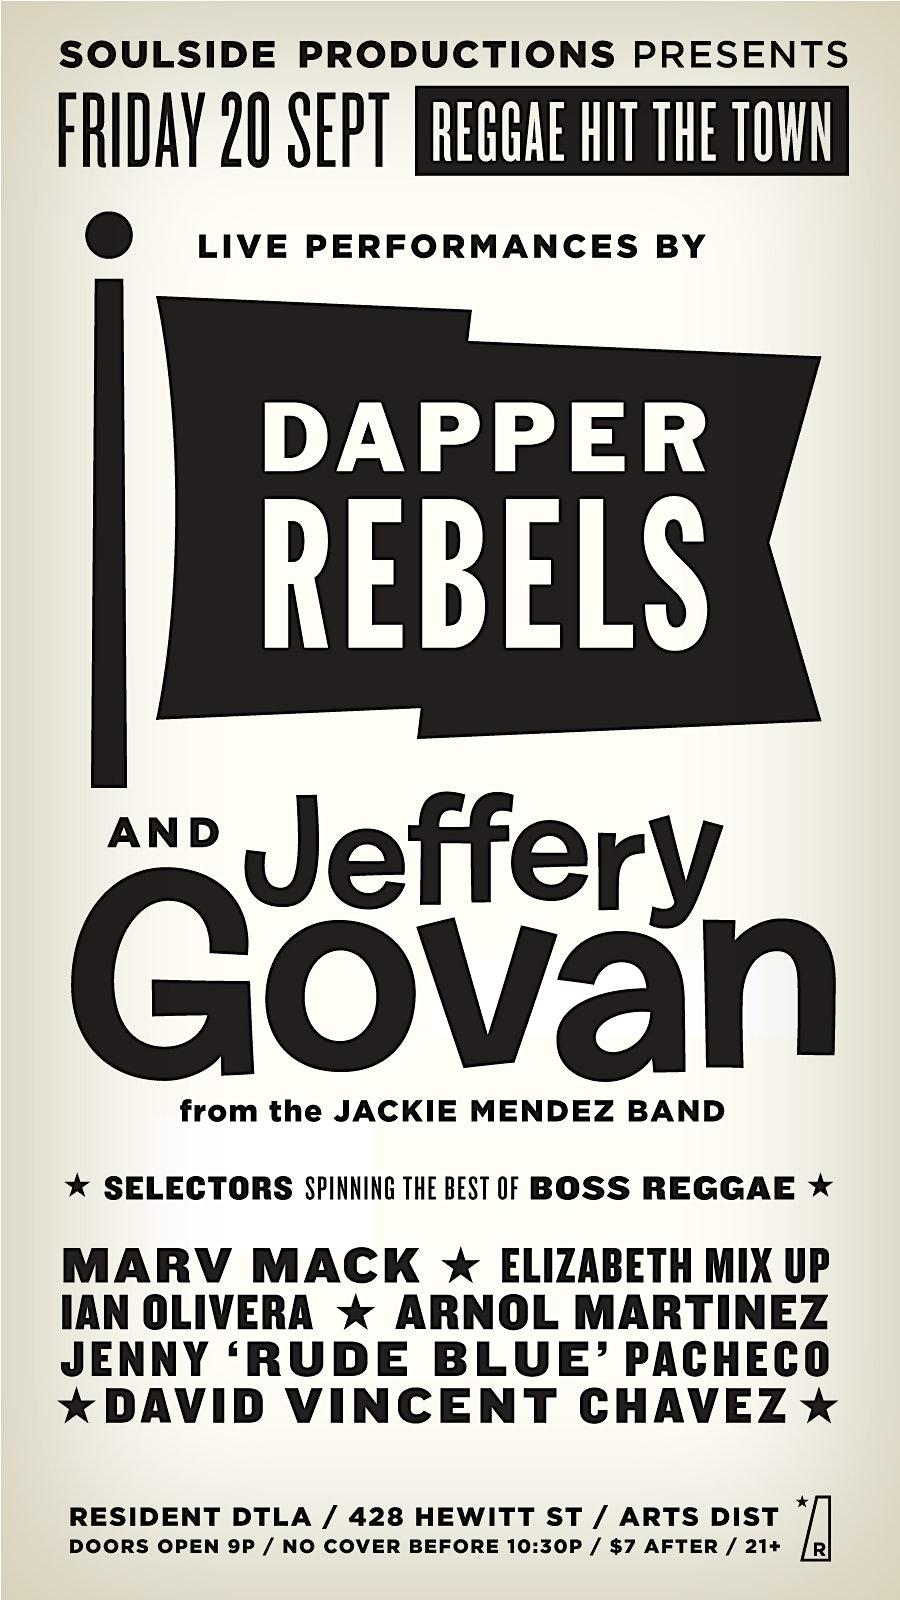 Reggae HIT the TOWN - Free B4 10:30pm